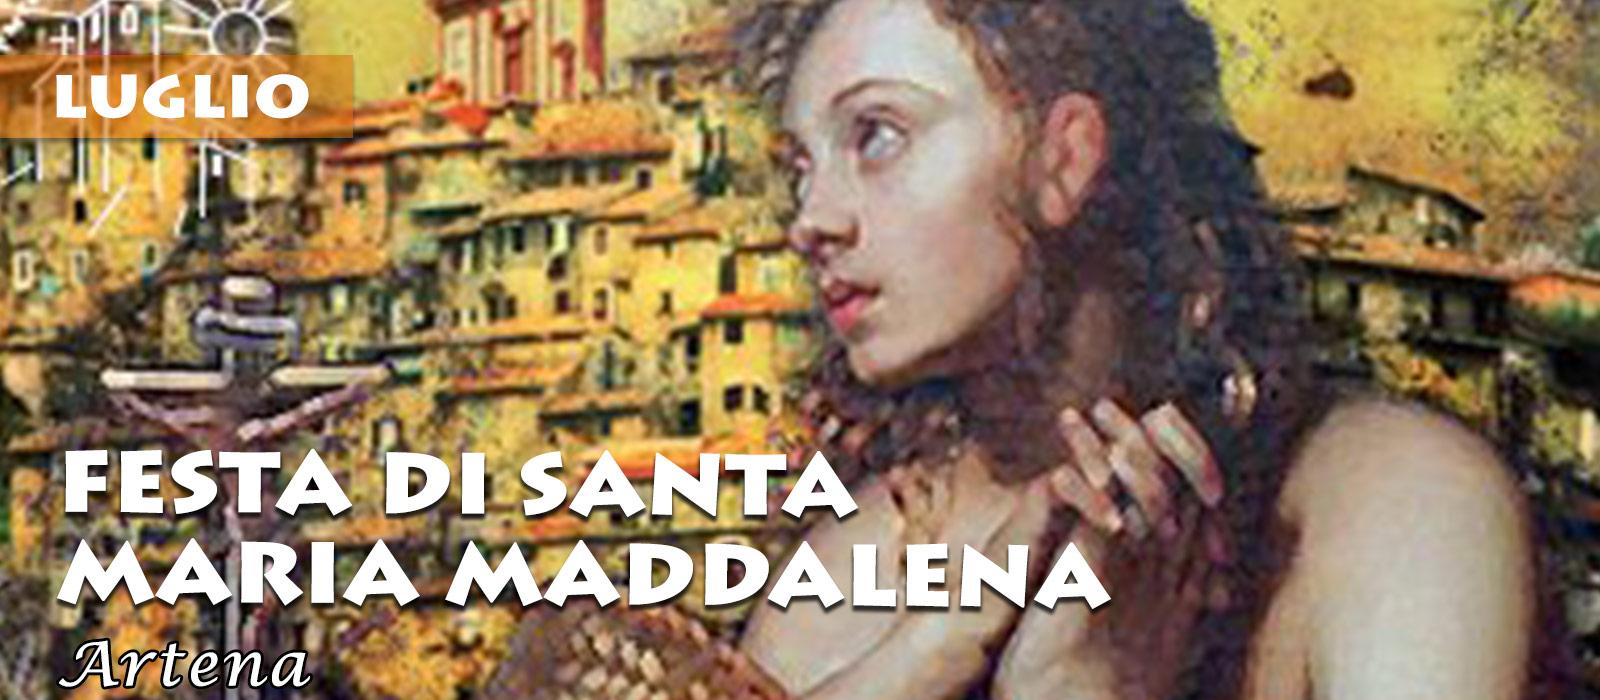 festa-santa-maria-maddalena-artena